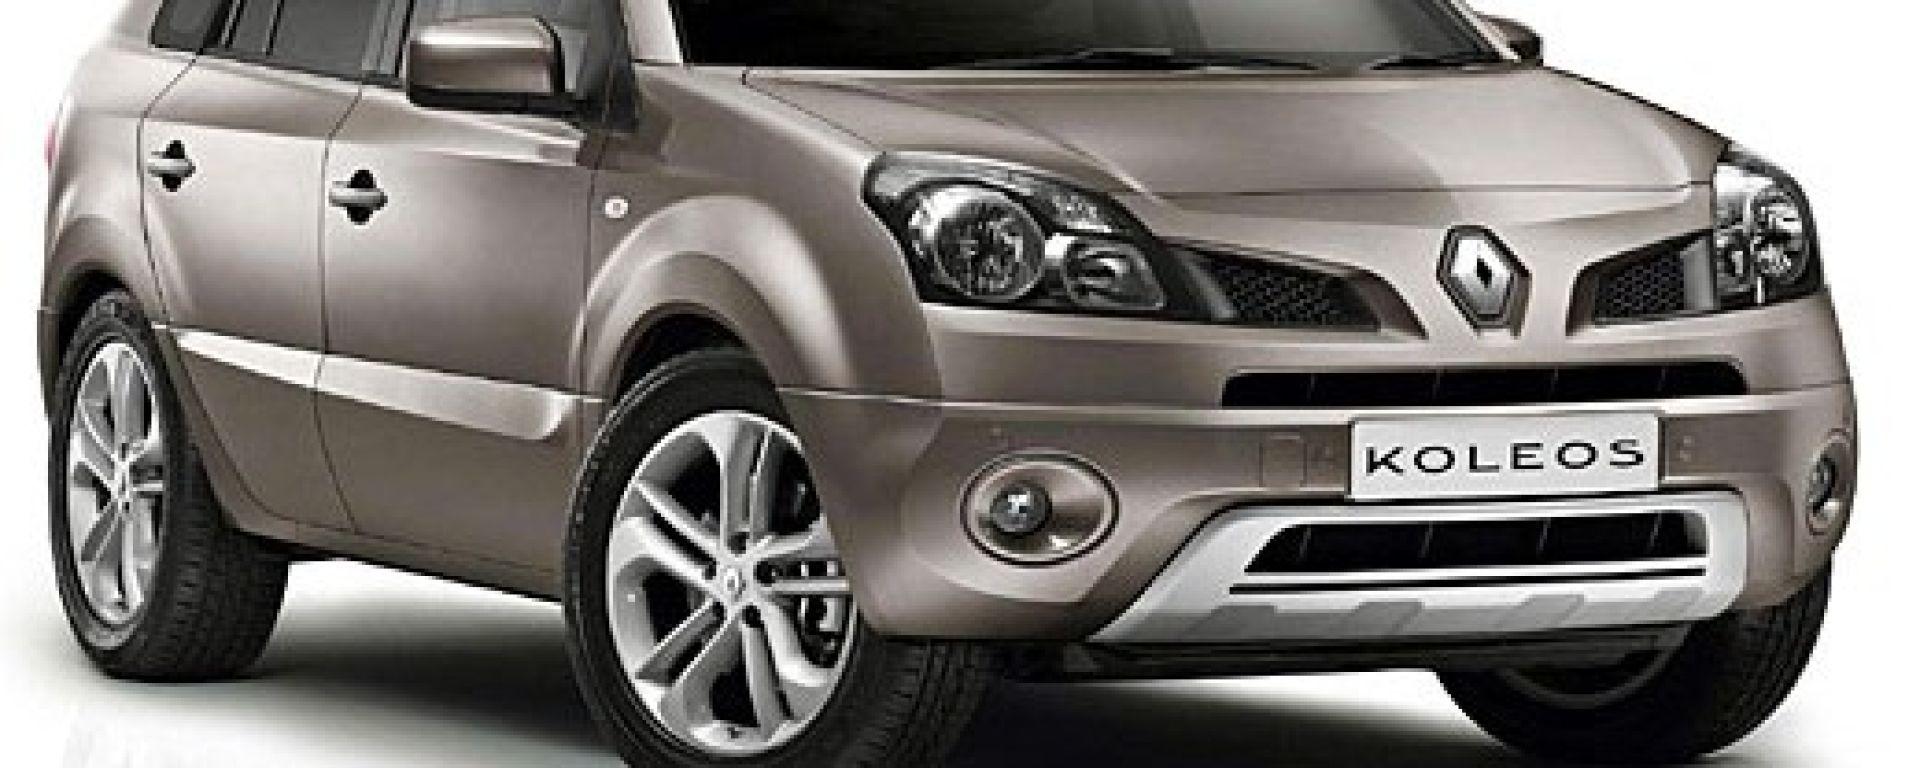 Renault Koleos my 2010